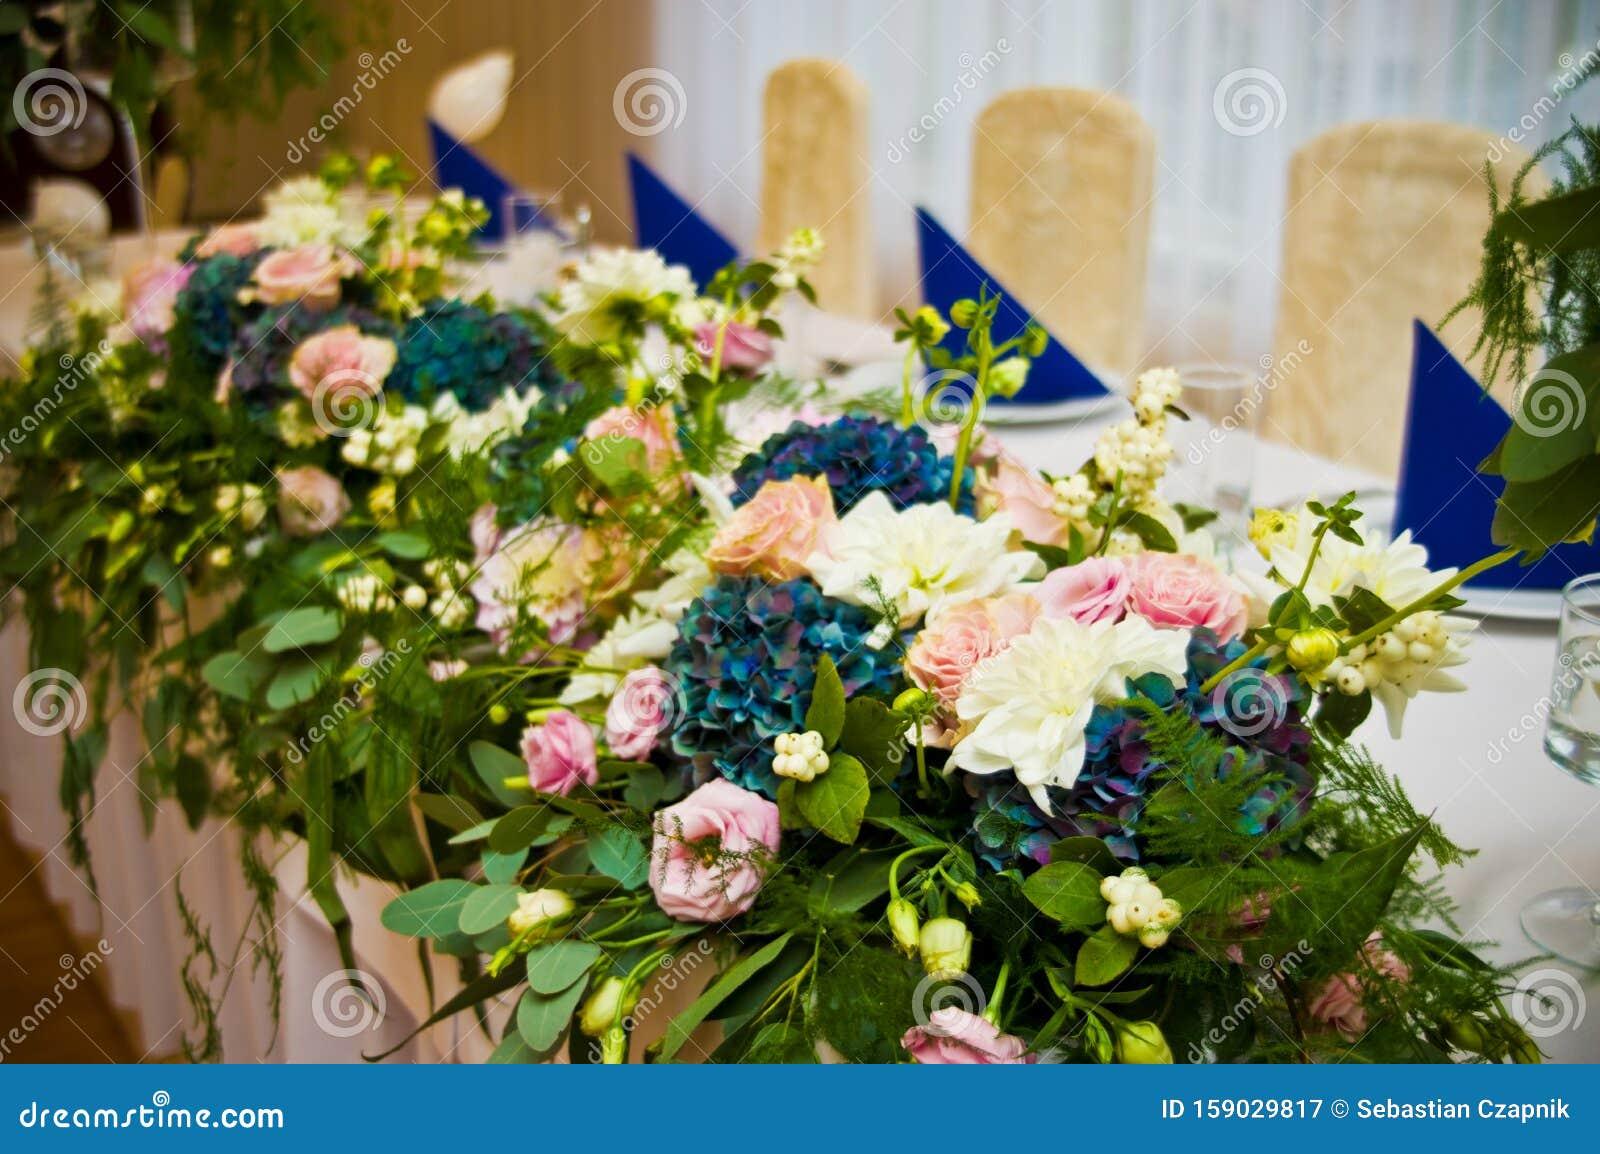 Wedding Hall Table Flowers Decoration Detail Stock Image Image Of Ballroom Florists 159029817